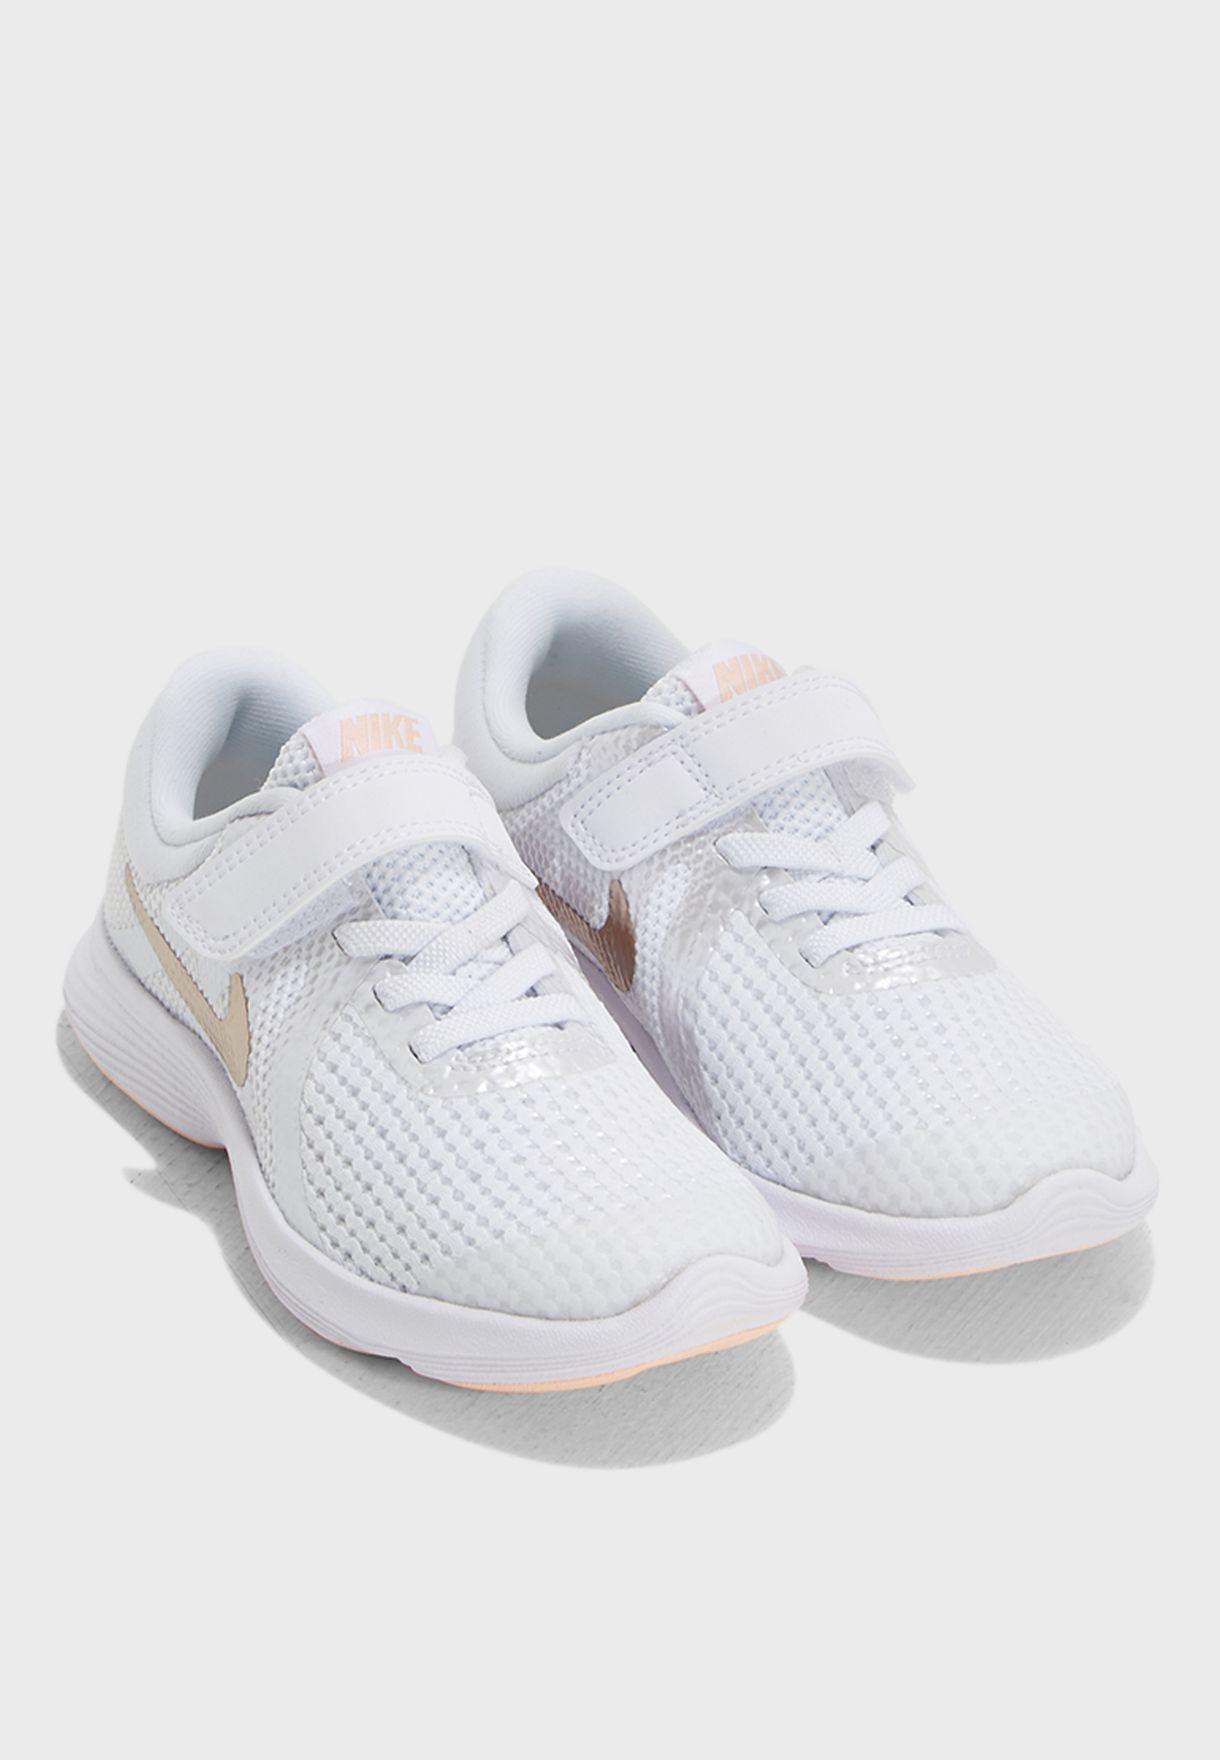 a38f2fa89340f Shop Nike white Revolution 4 Kids 943307-100 for Kids in UAE ...